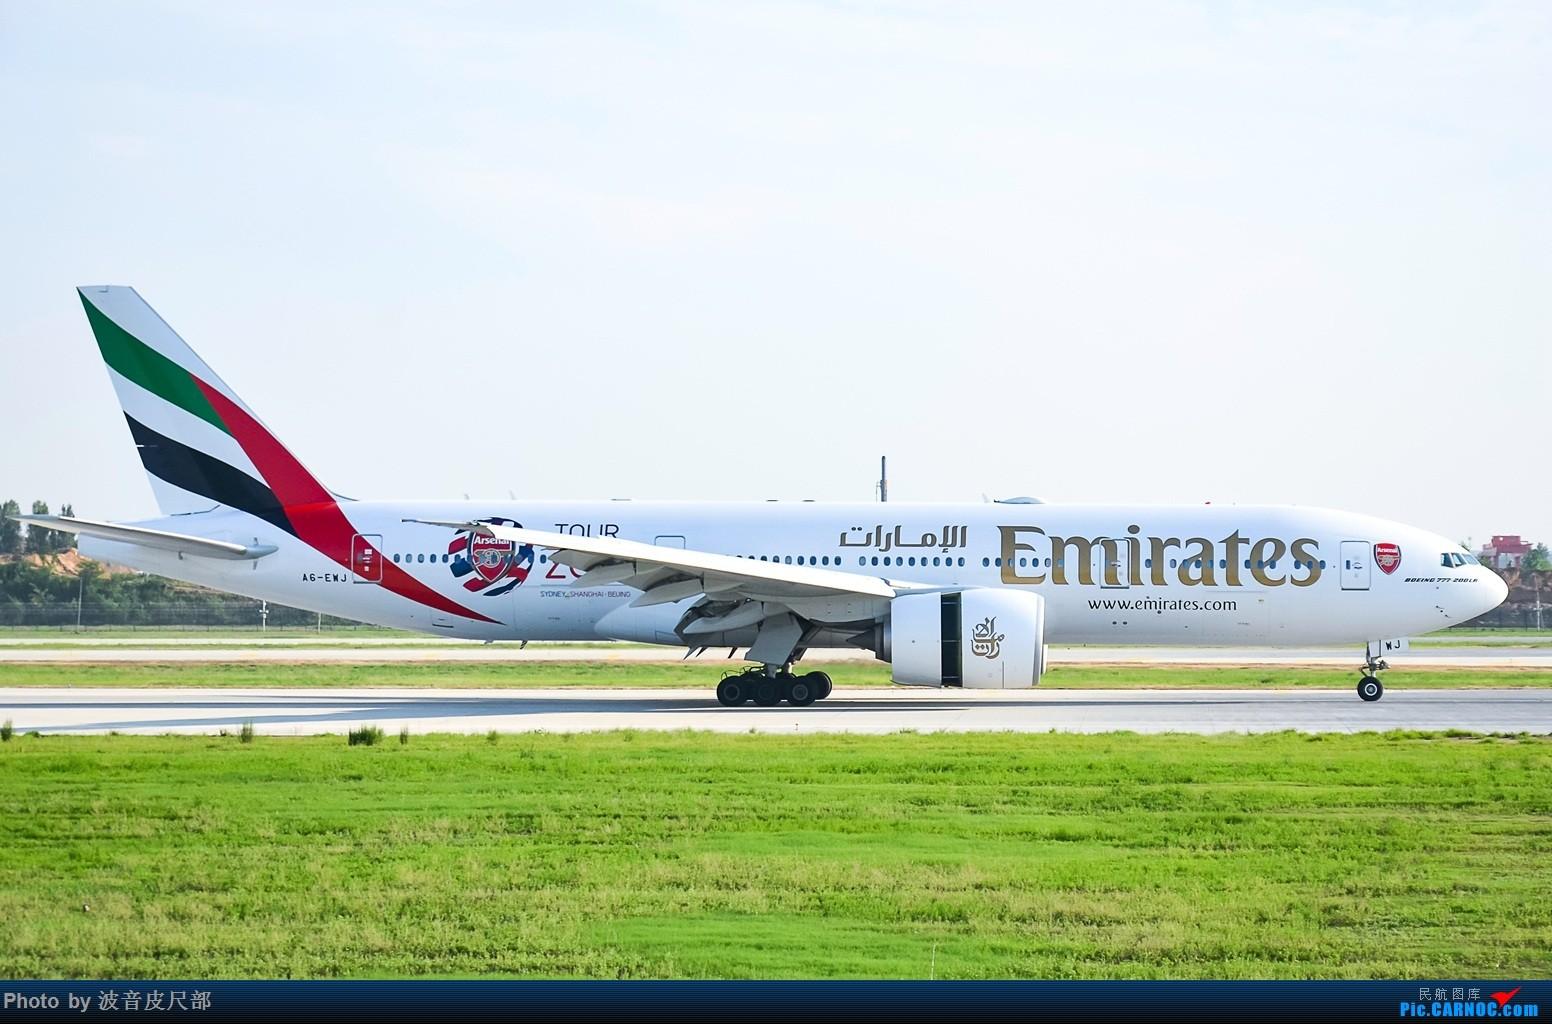 Re:[原创]郑州机场近期彩绘合集 BOEING 777-200LR A6-EWJ 中国郑州新郑国际机场